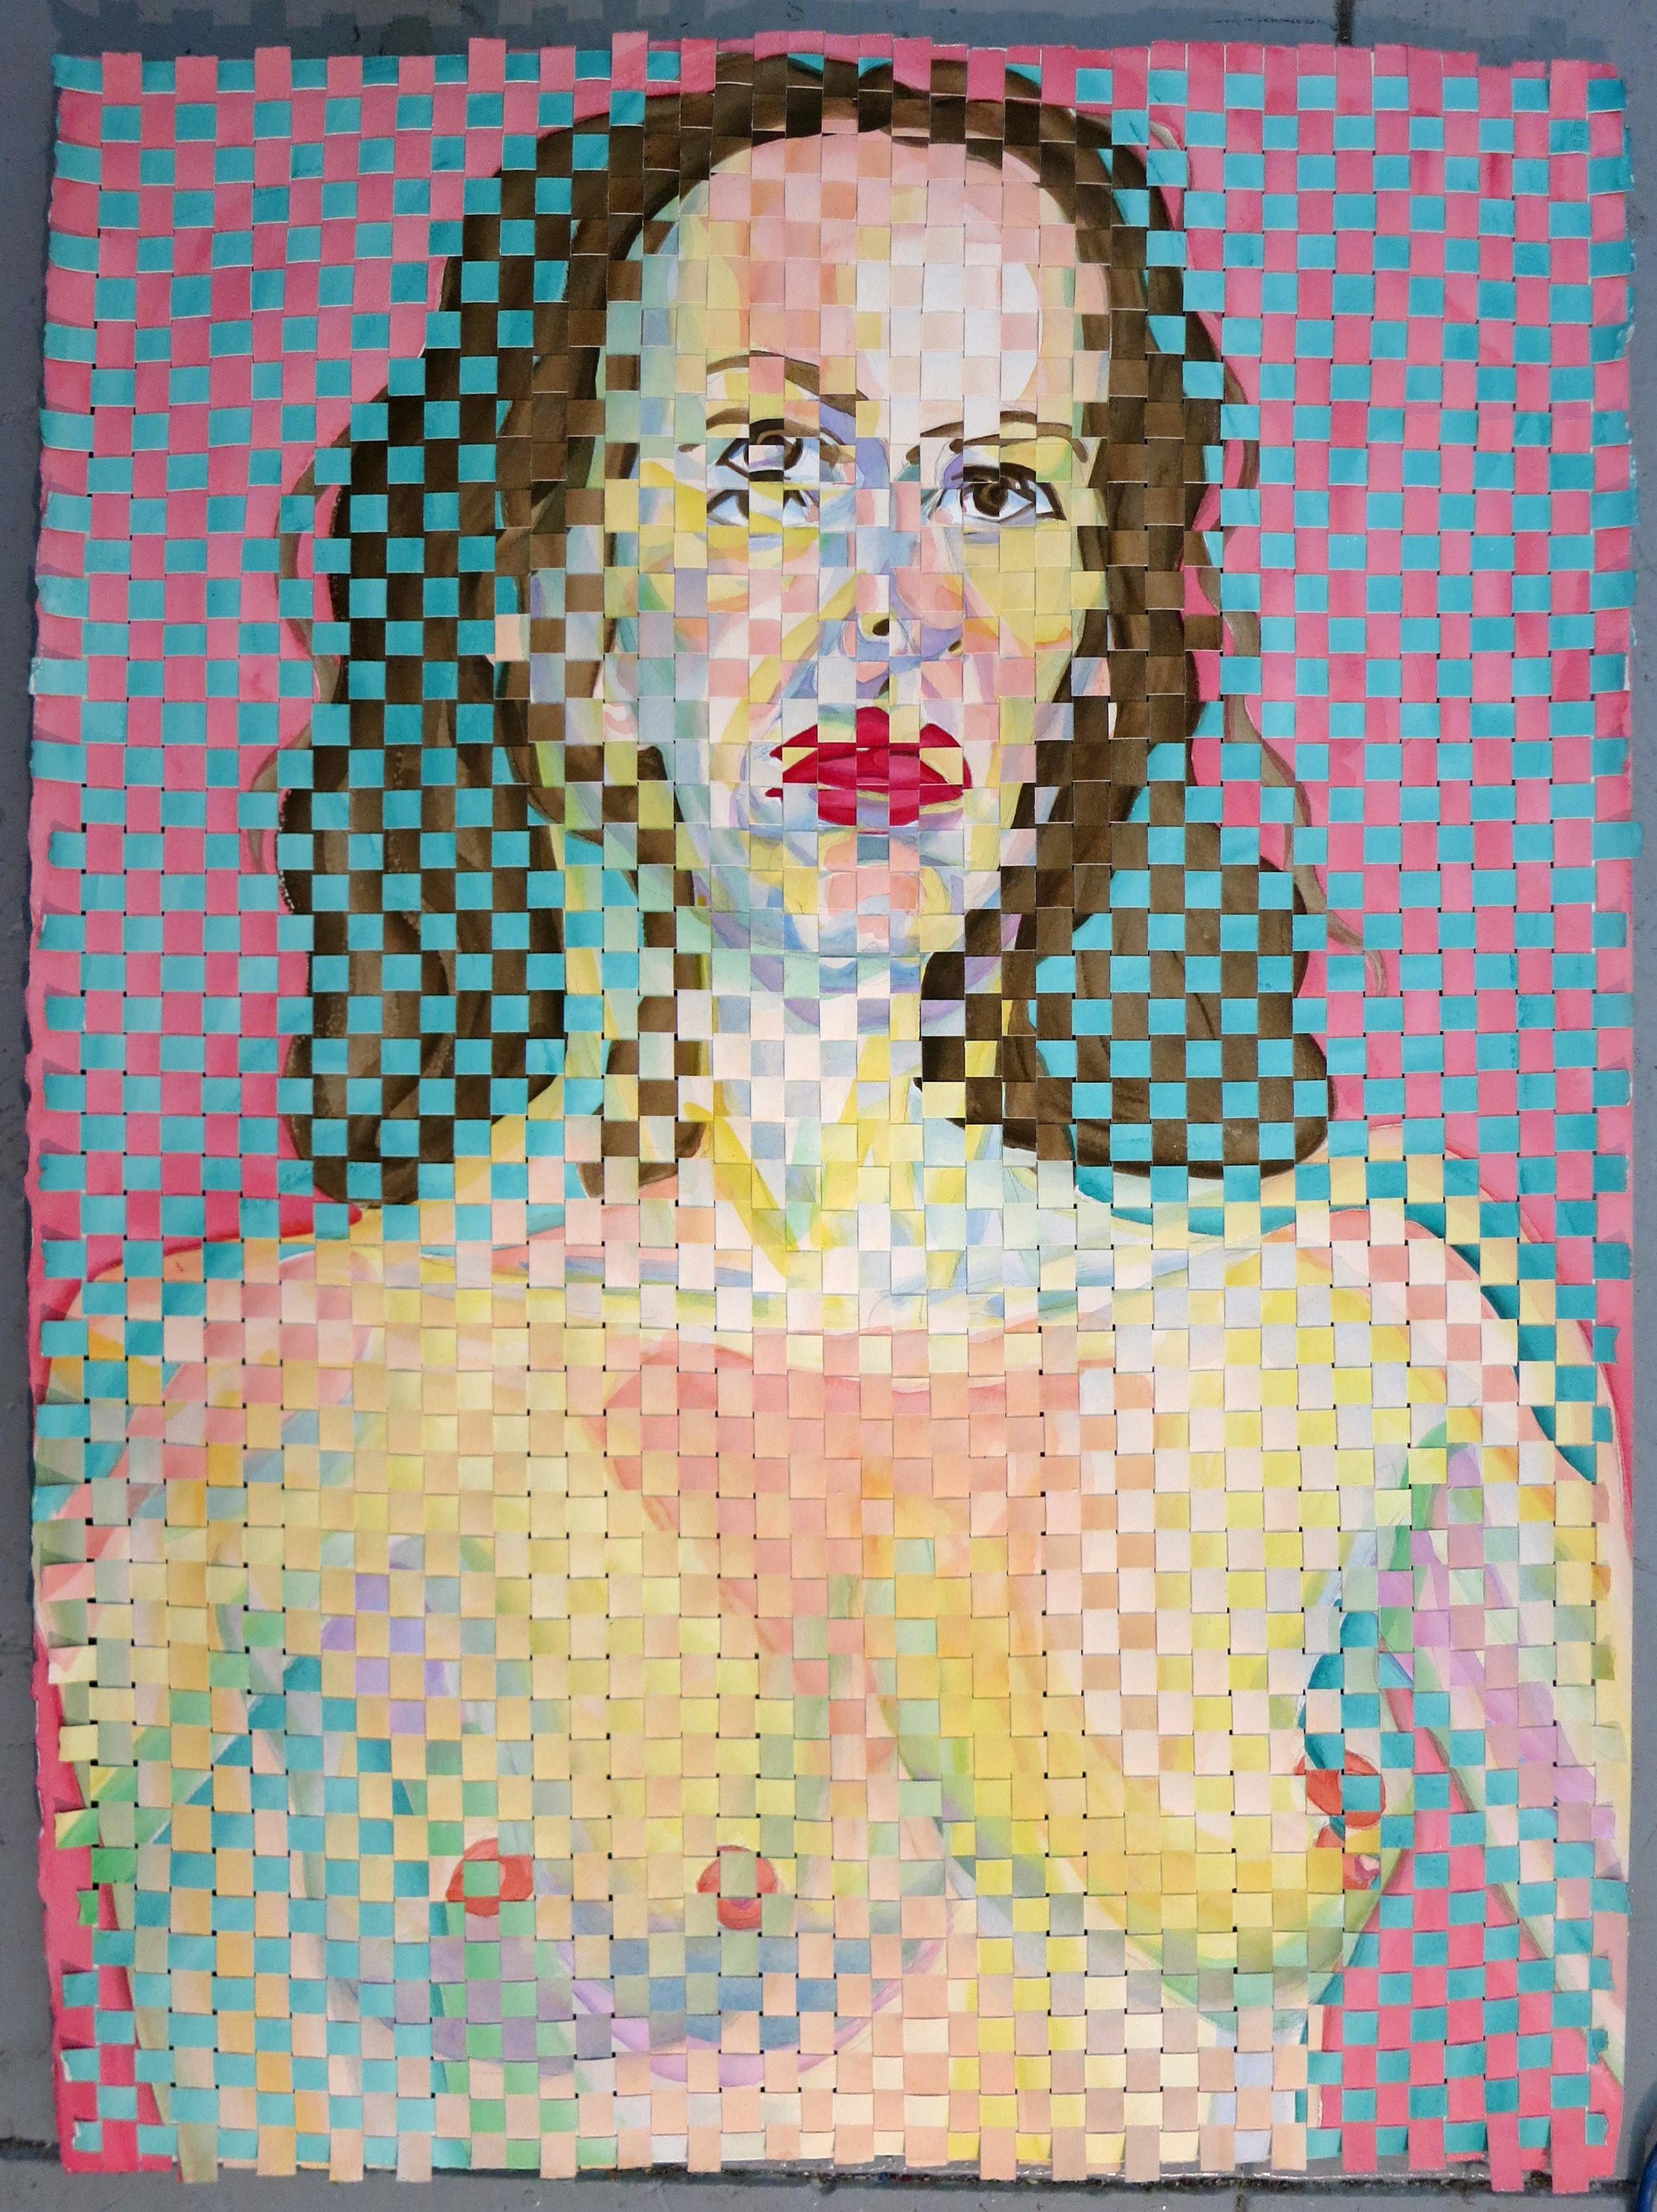 Woven Self-Portrait 020717